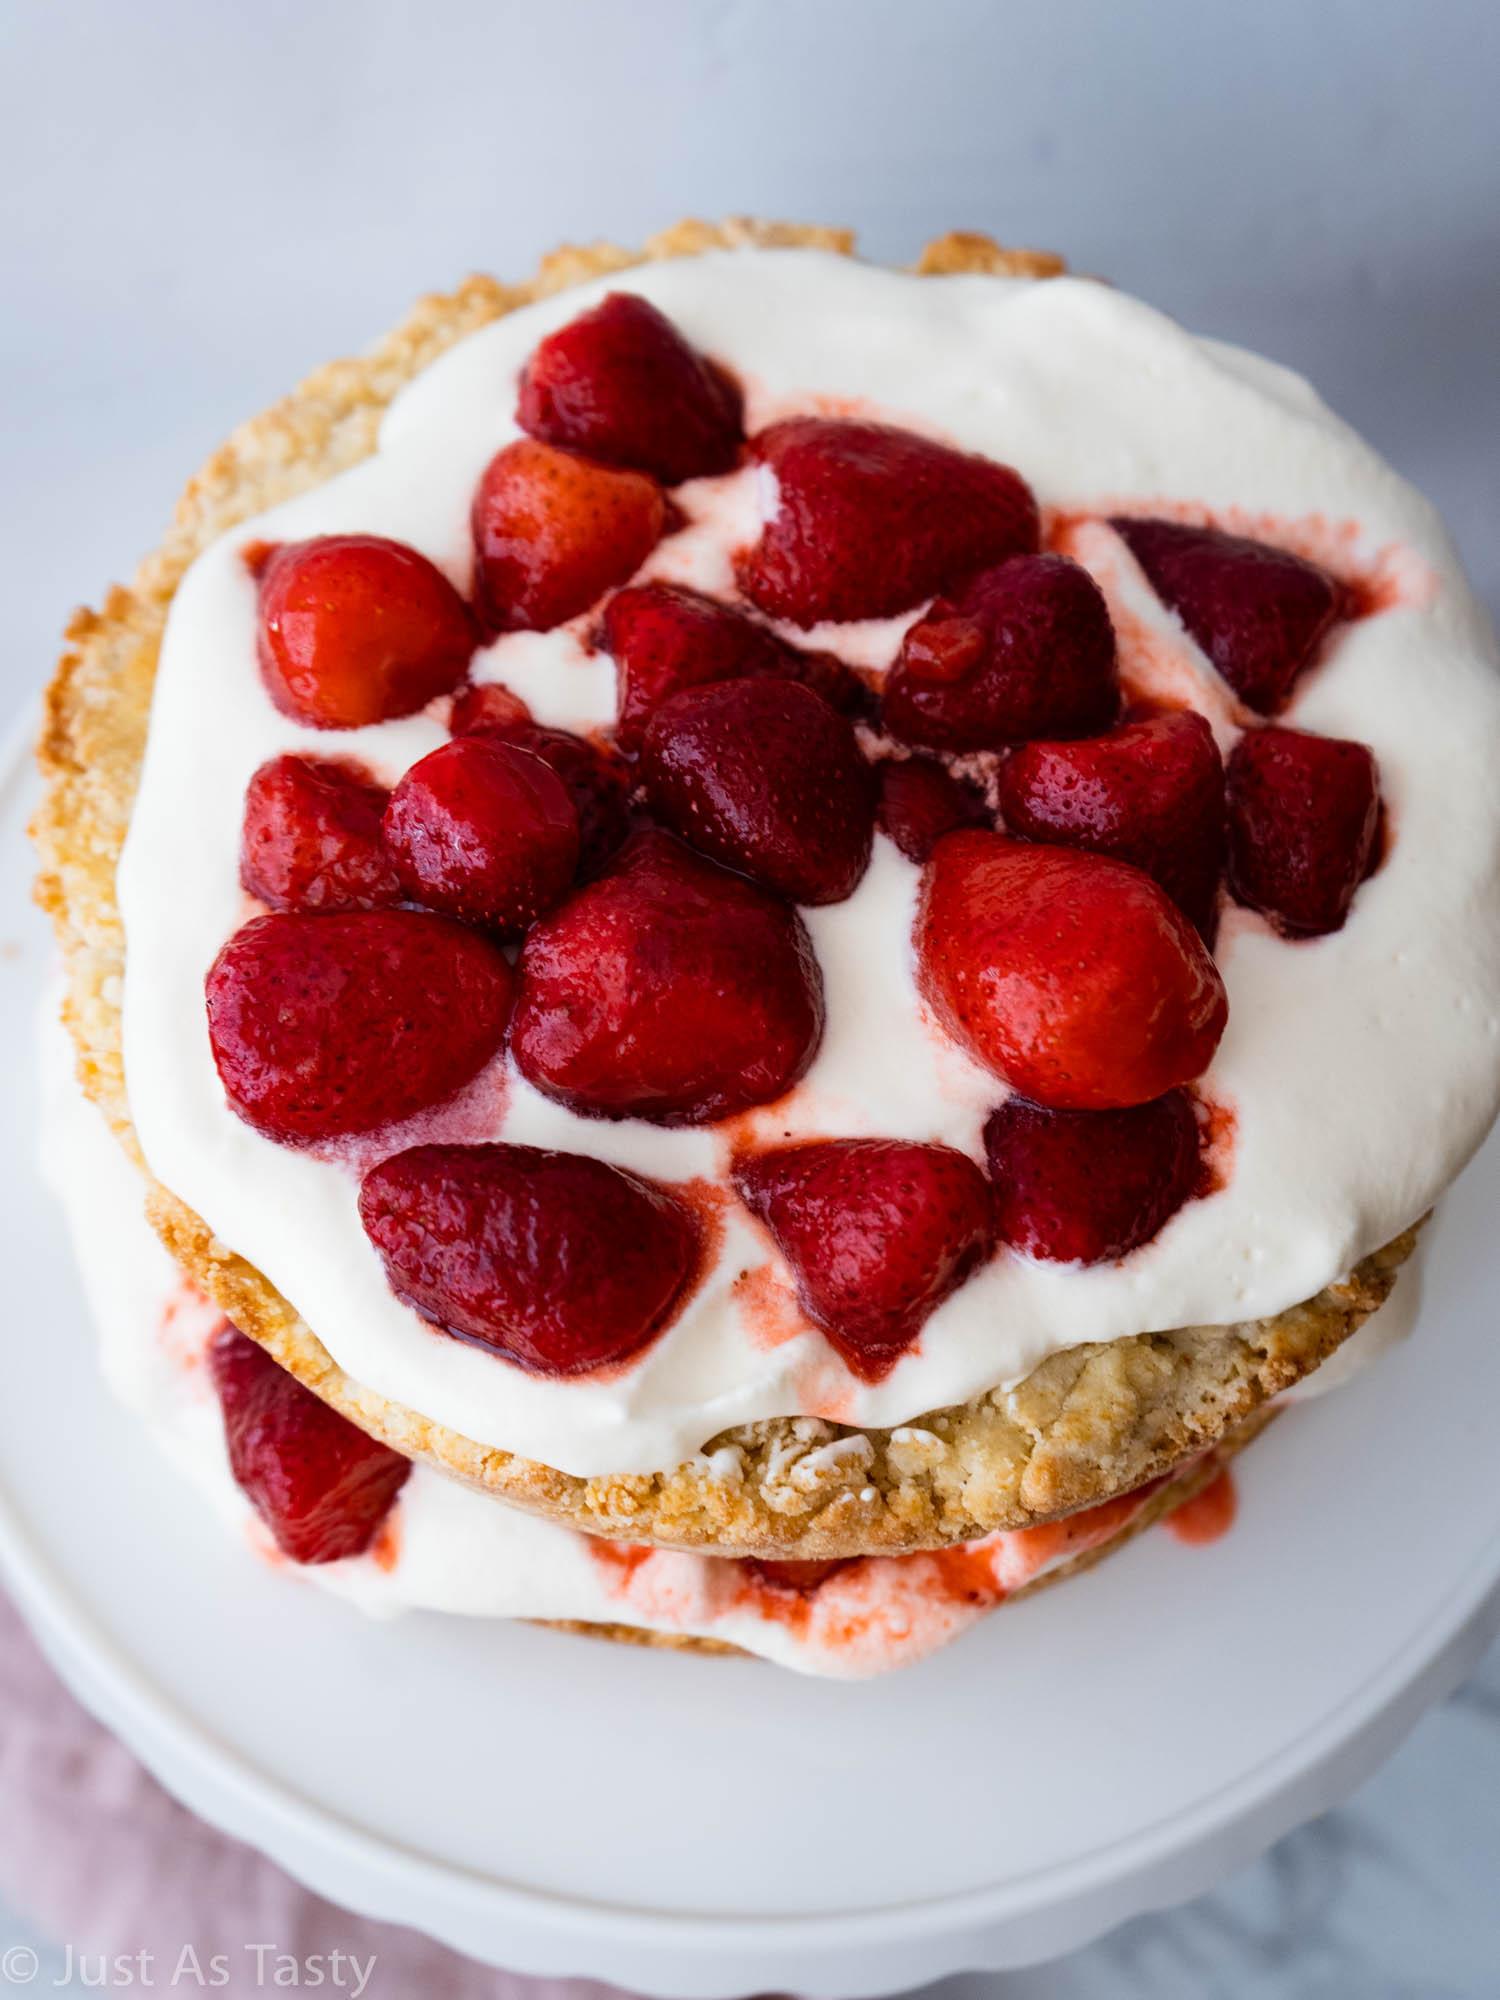 Strawberry shortcake on a white cake stand.